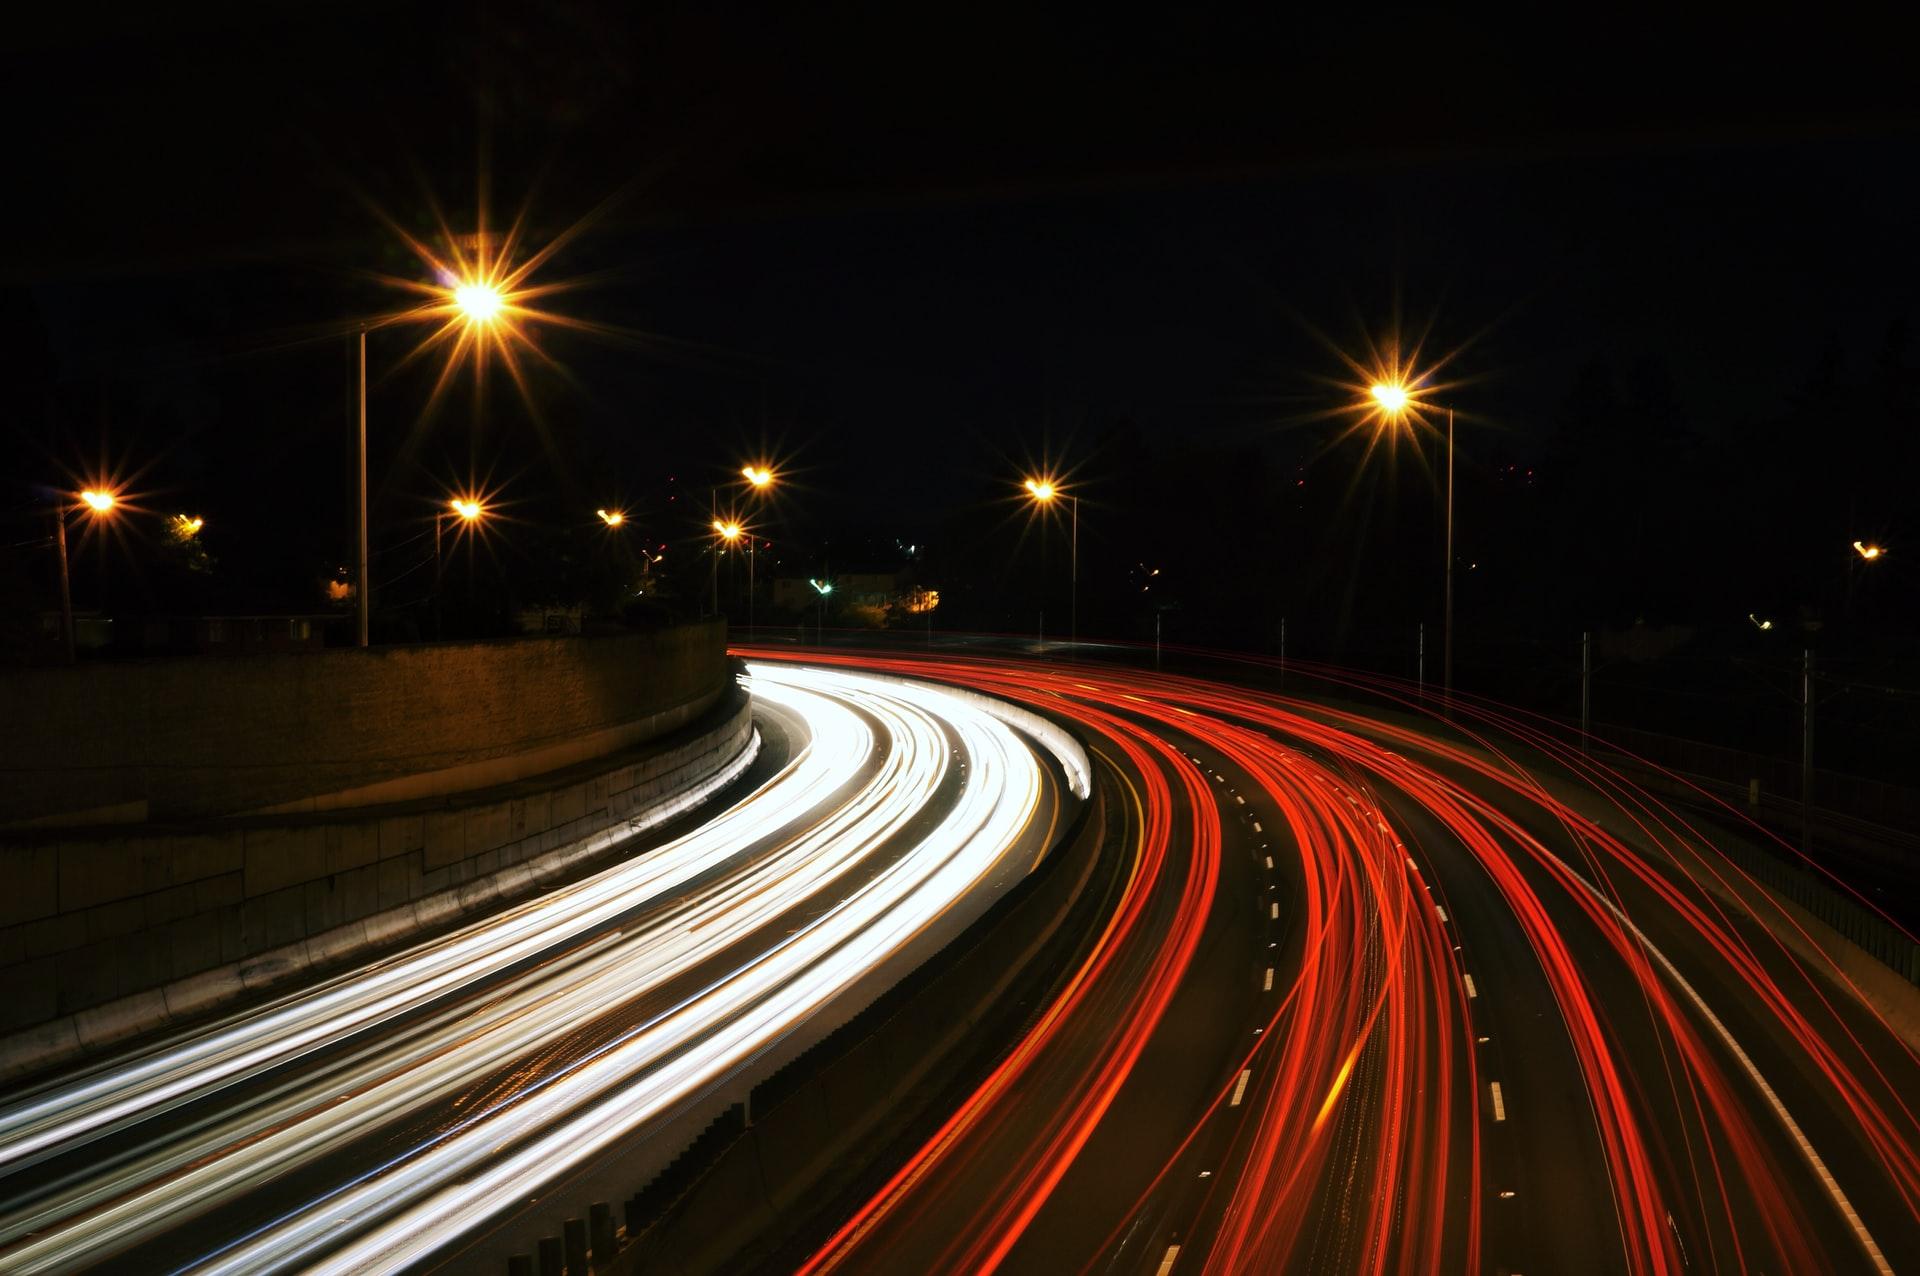 Nightime traffic. Photo by Jake Givens on Unsplash.